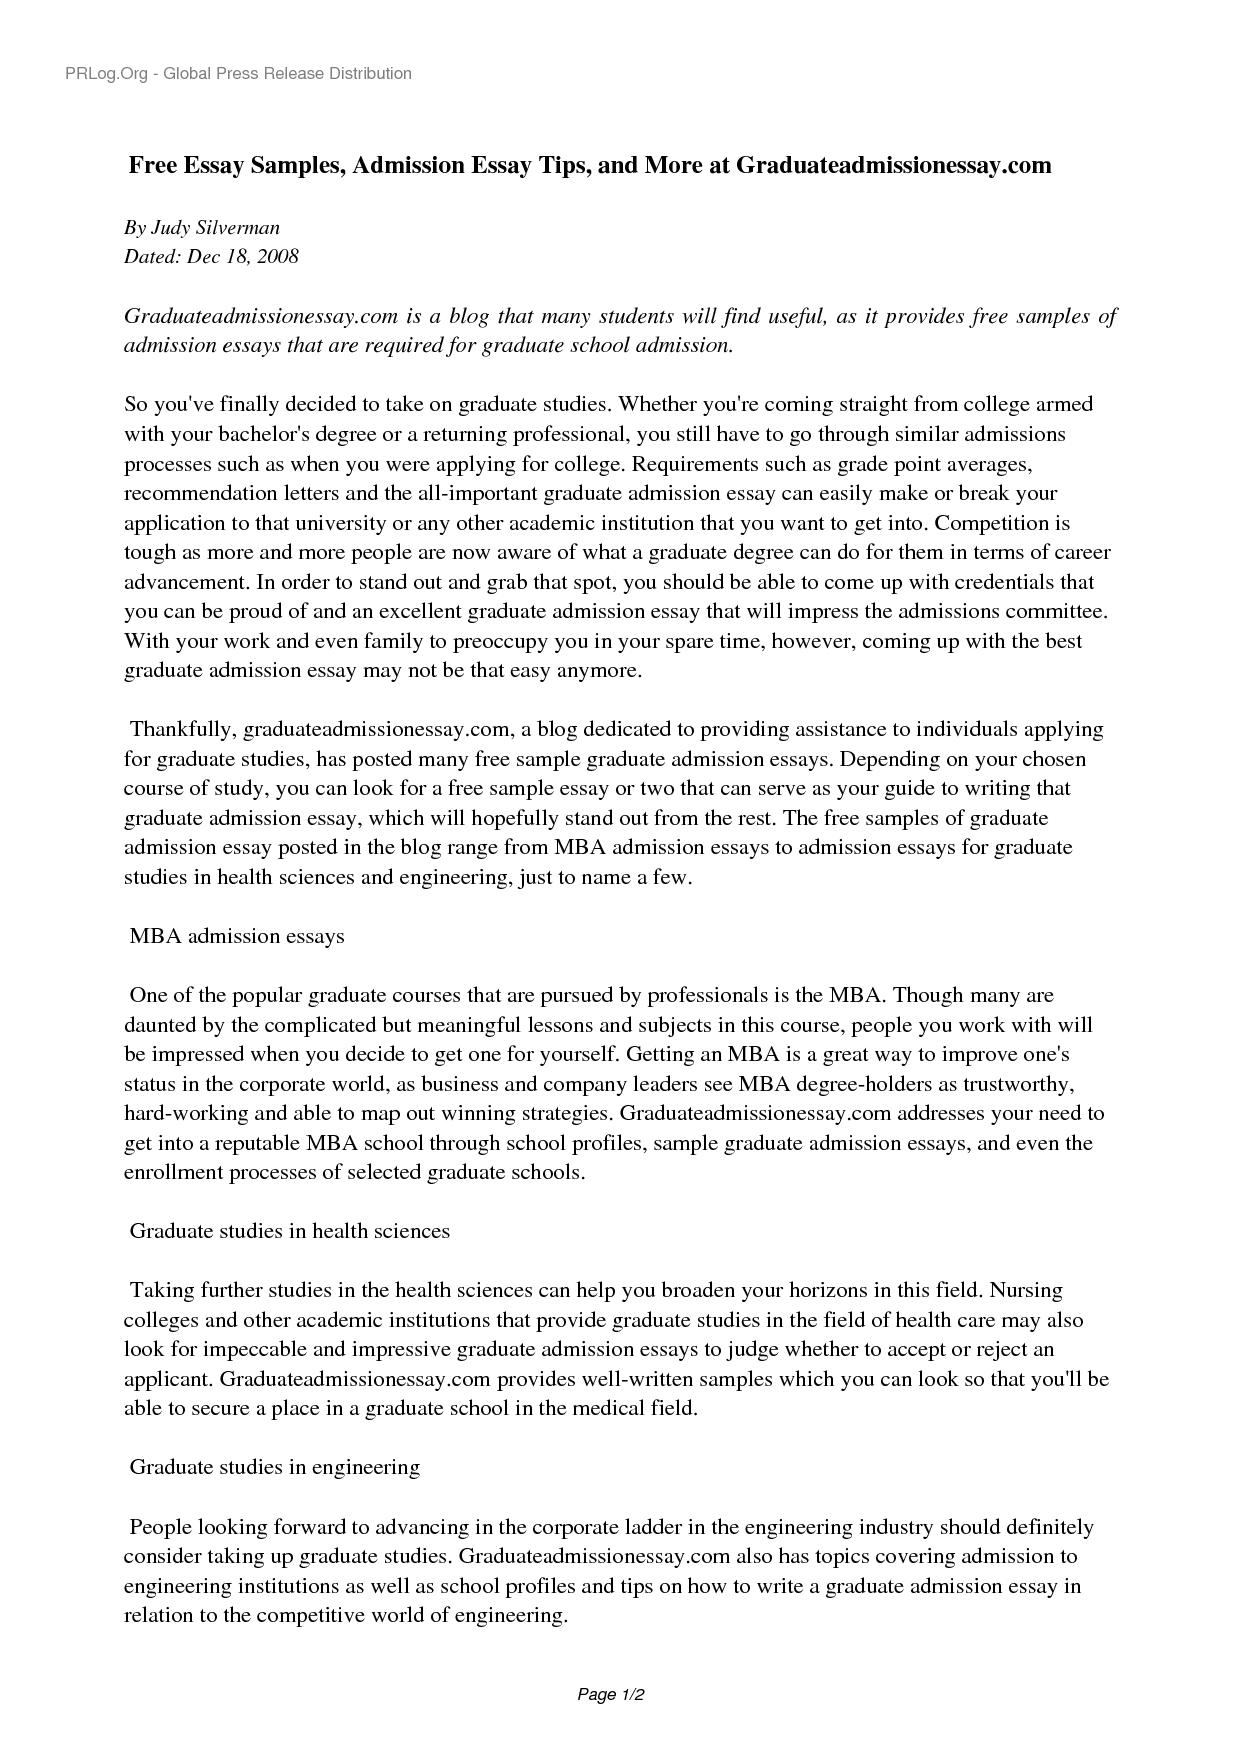 001 Yhn3ns0535 Free Sample Essay For Graduate School Admission Formidable Pdf Full